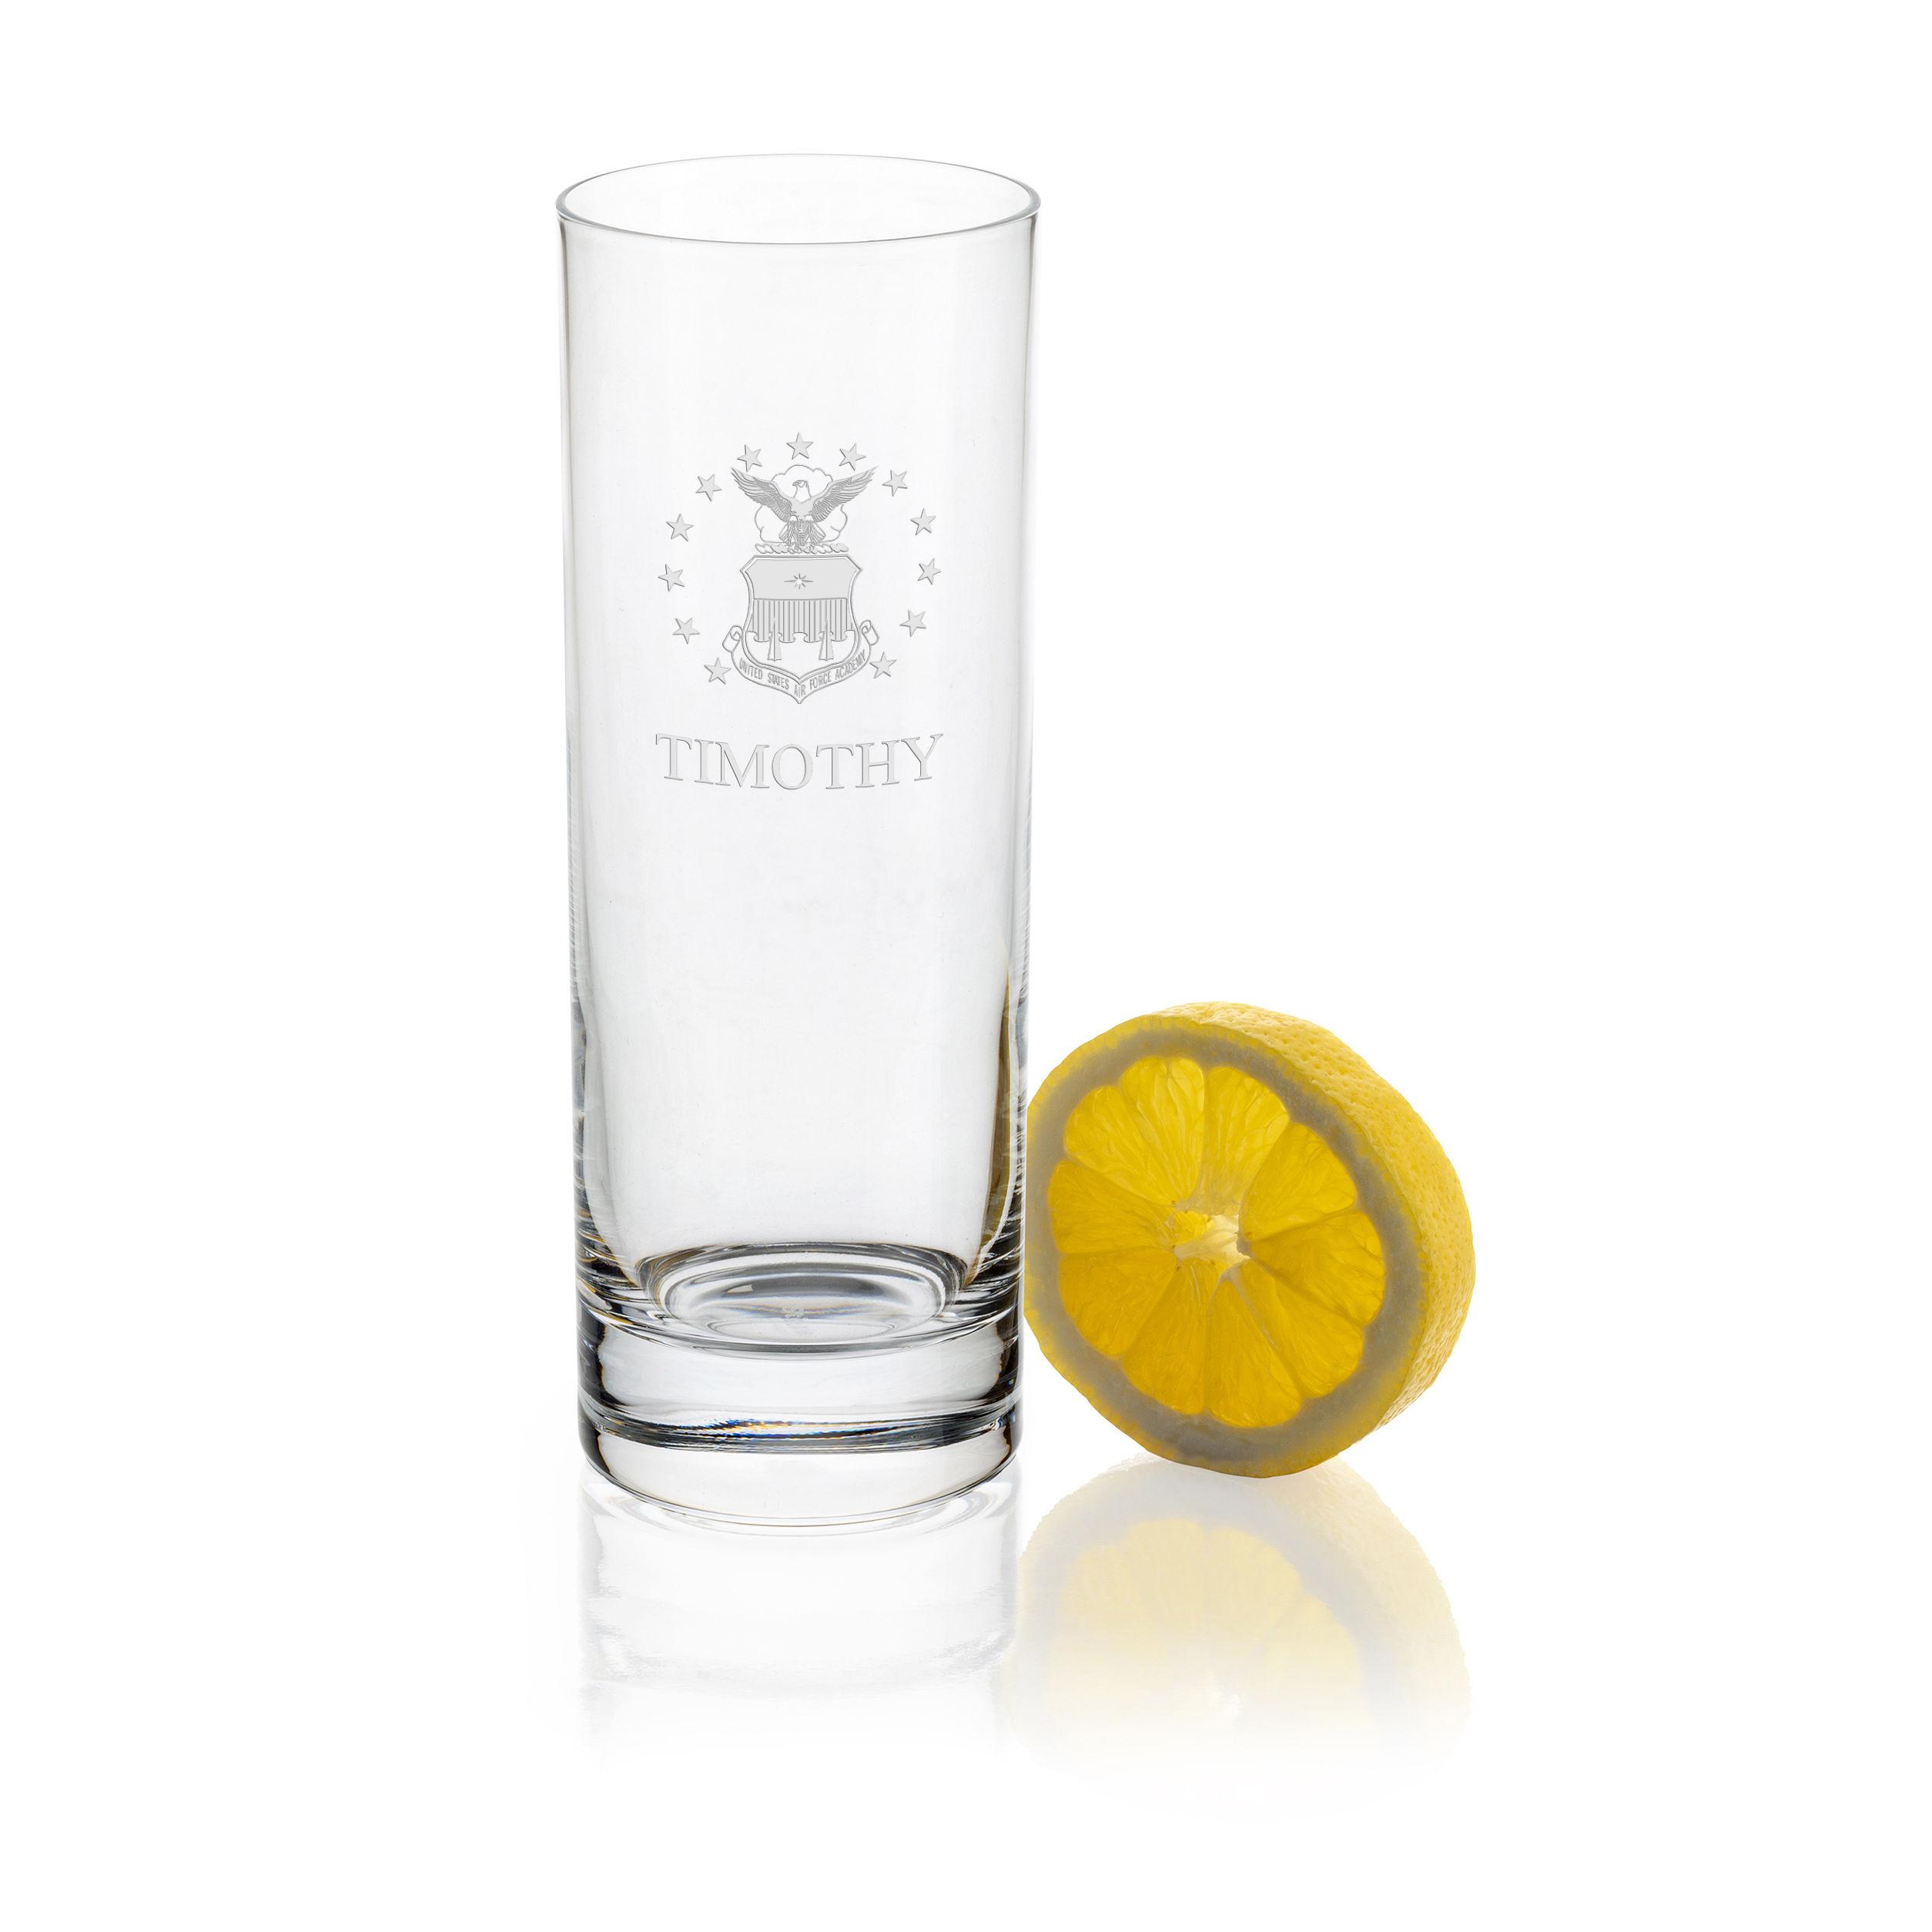 USAFA Iced Beverage Glasses - Set of 4